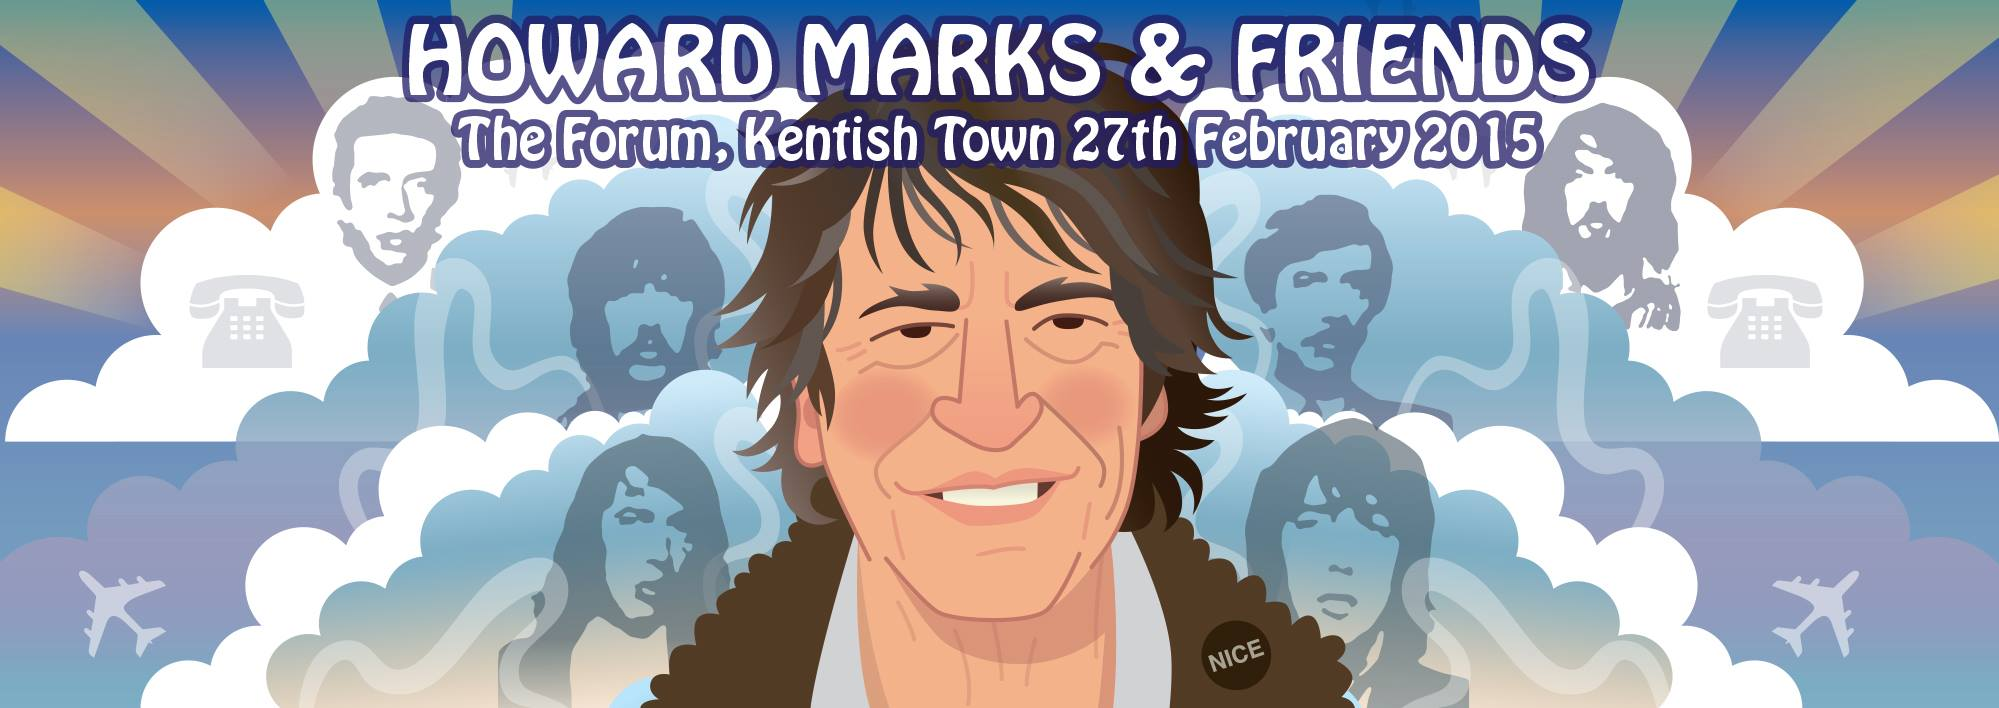 Howard Marks & Friends artwork by Pete Fowler